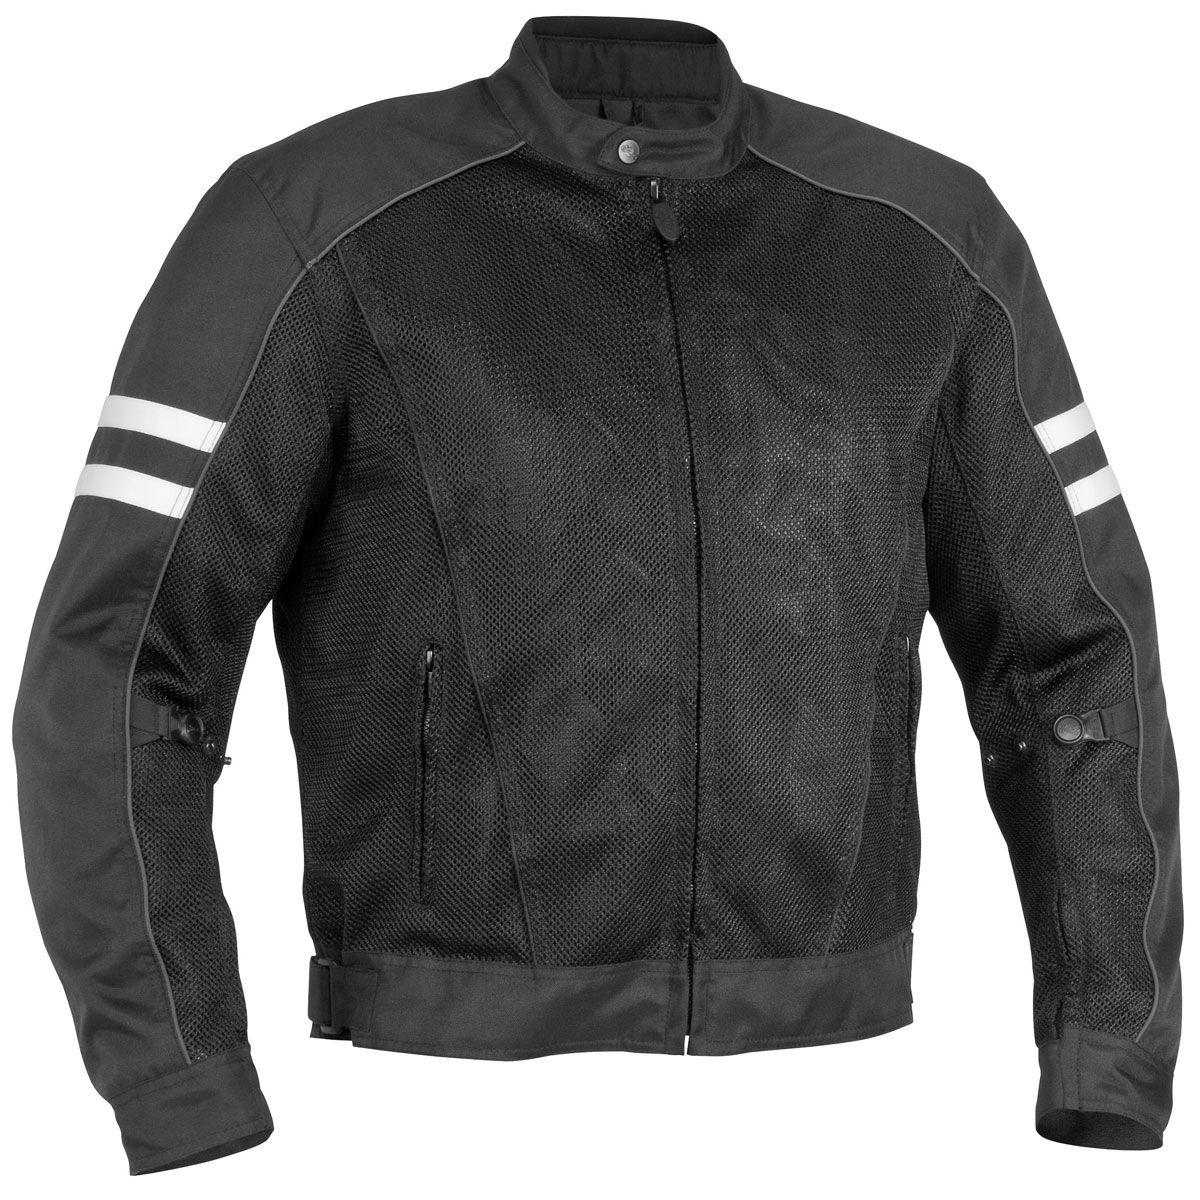 River Road 'Baron' Mens Mesh/Textile Jacket - LeatherUp.com